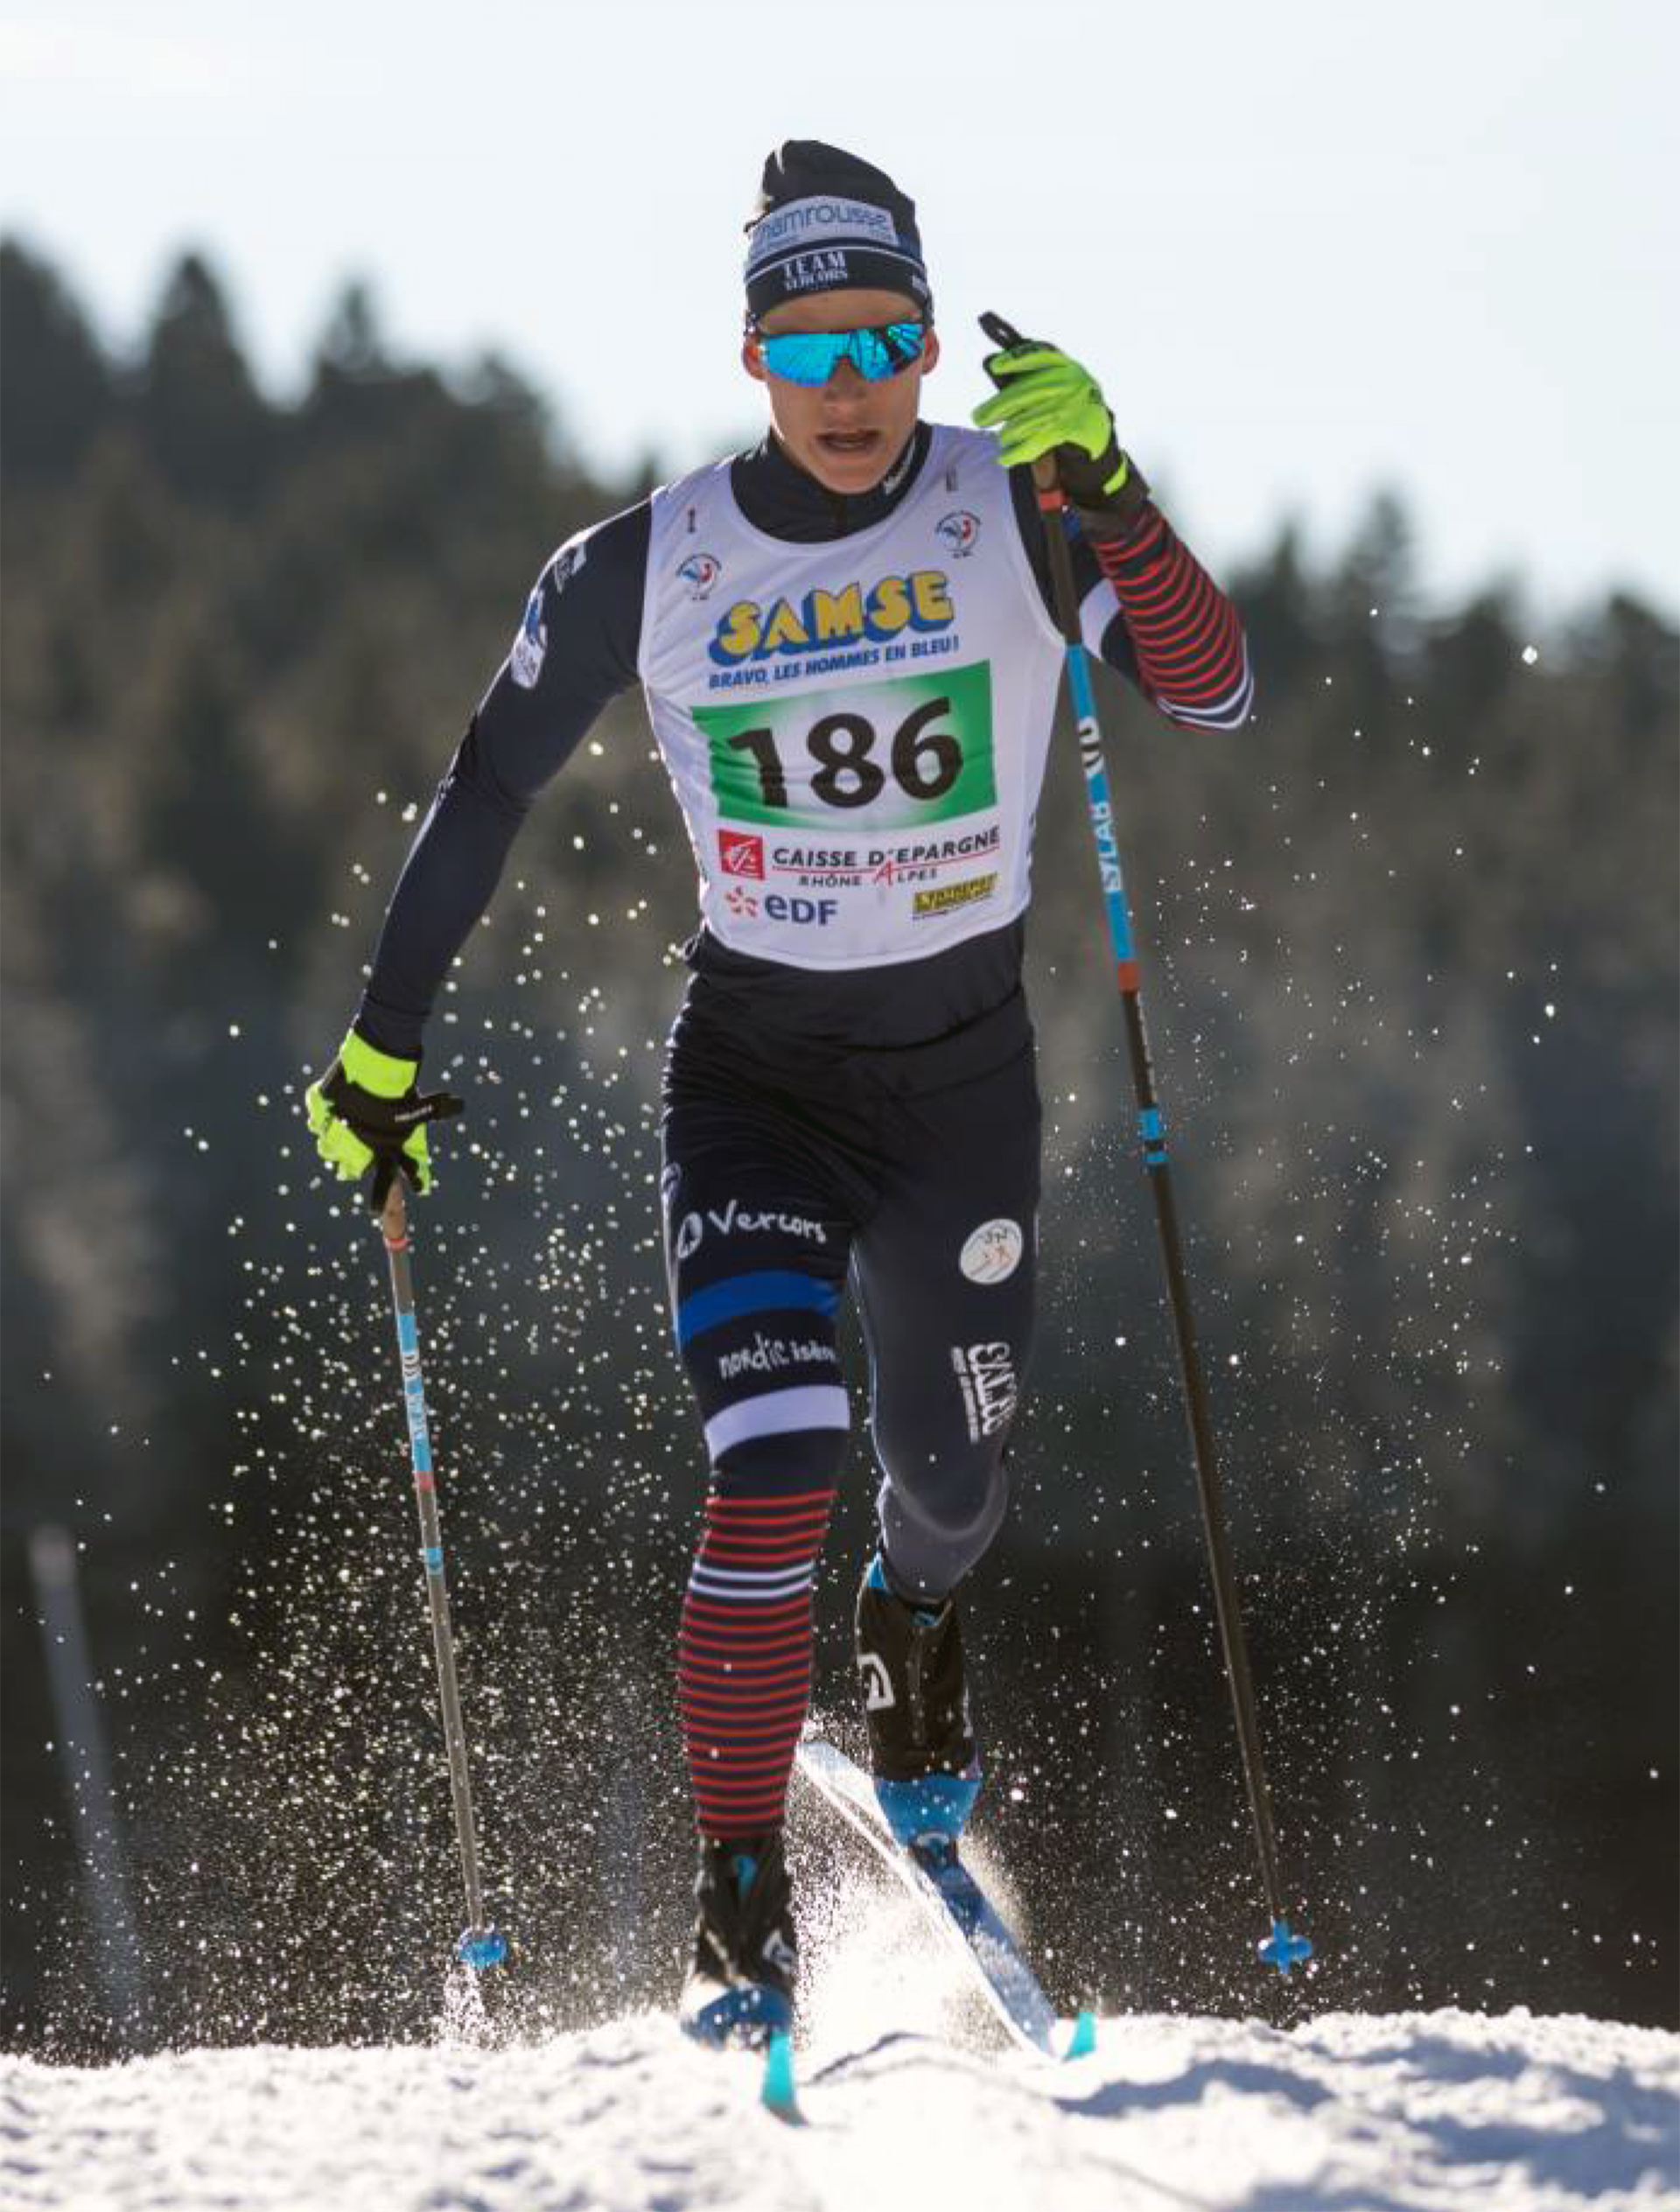 Chamrousse champion jérémy royer ski fond skating snbc station ski isère france - © Jérémy Royer